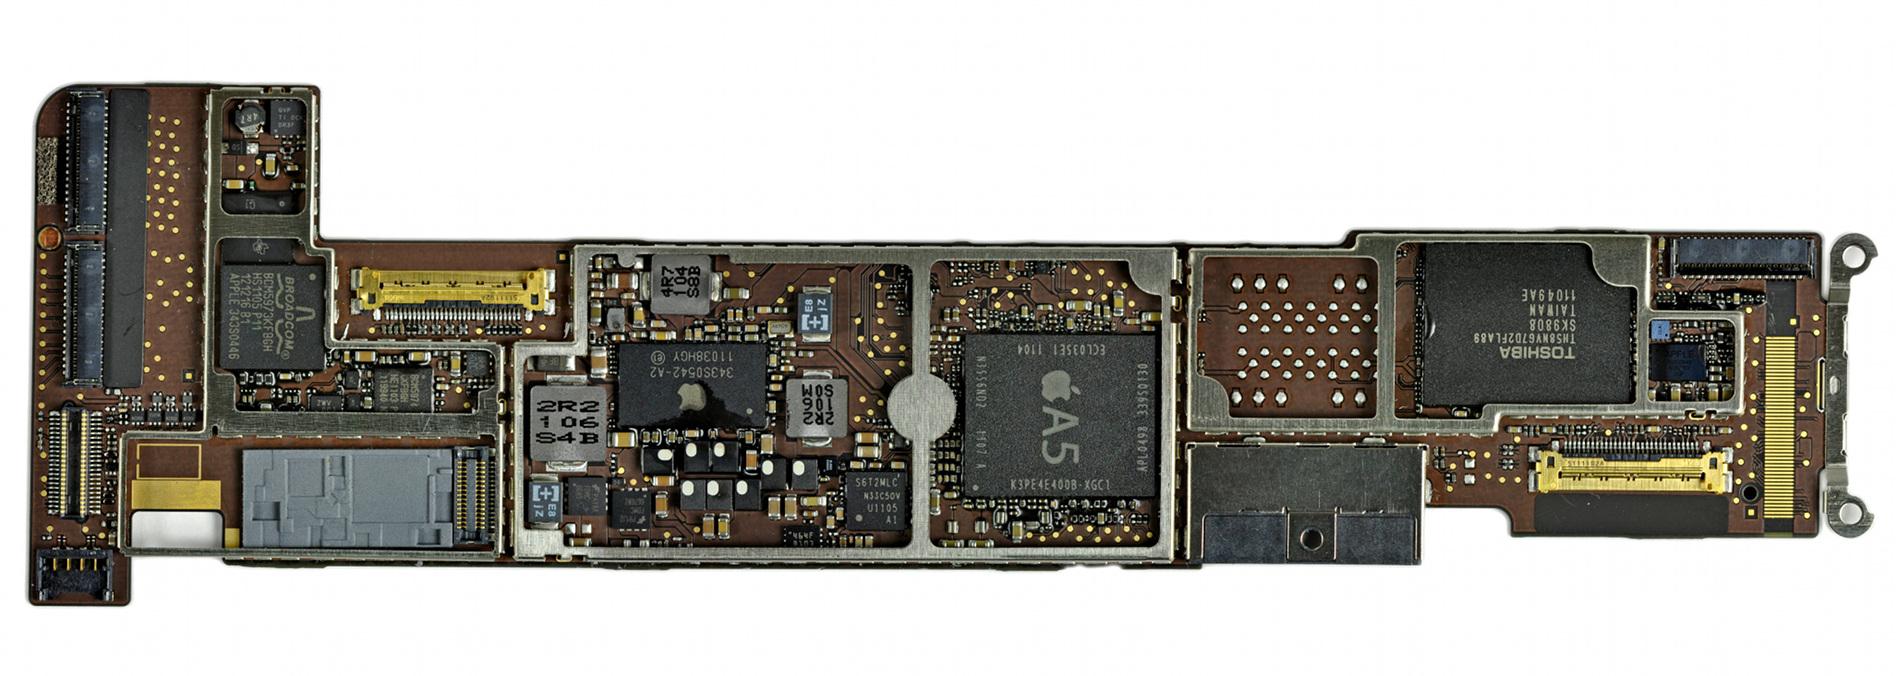 how to put epubs on ipad mini